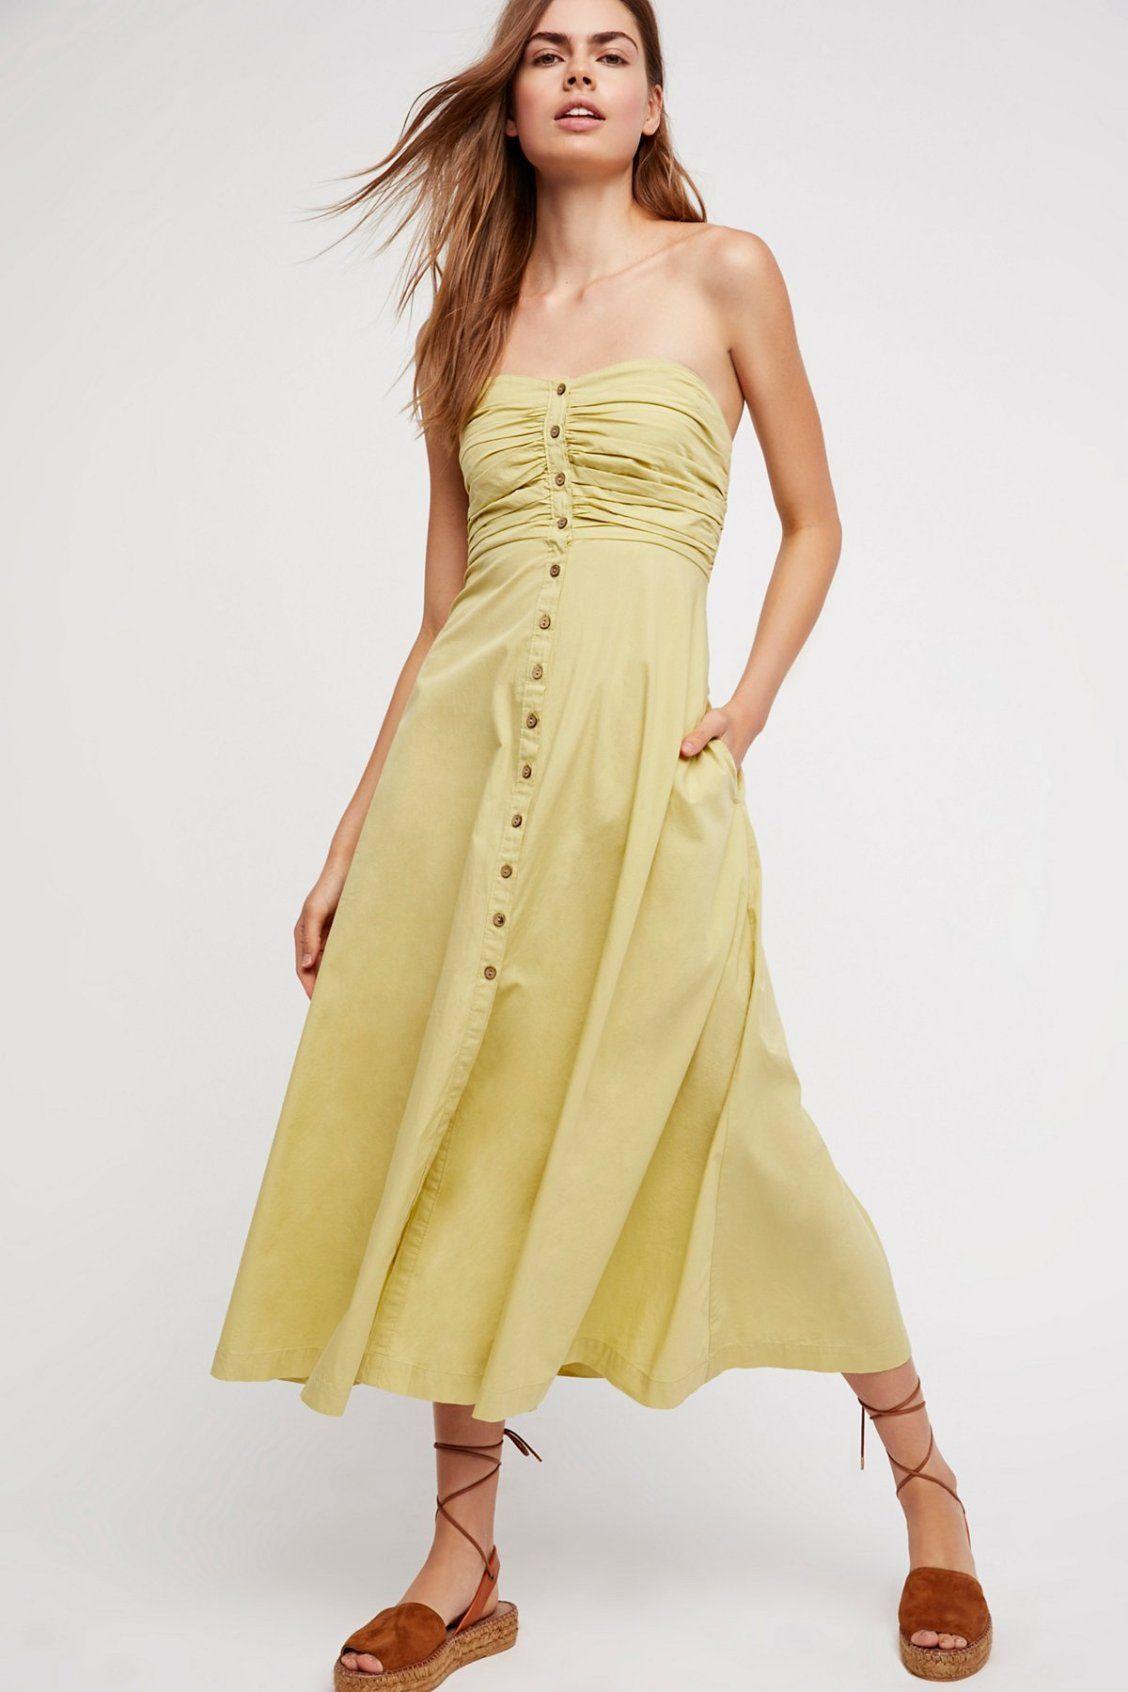 The Isha Tube Midi Dress Tube Midi Dress Fashion Feminine Dresses [ 1692 x 1128 Pixel ]